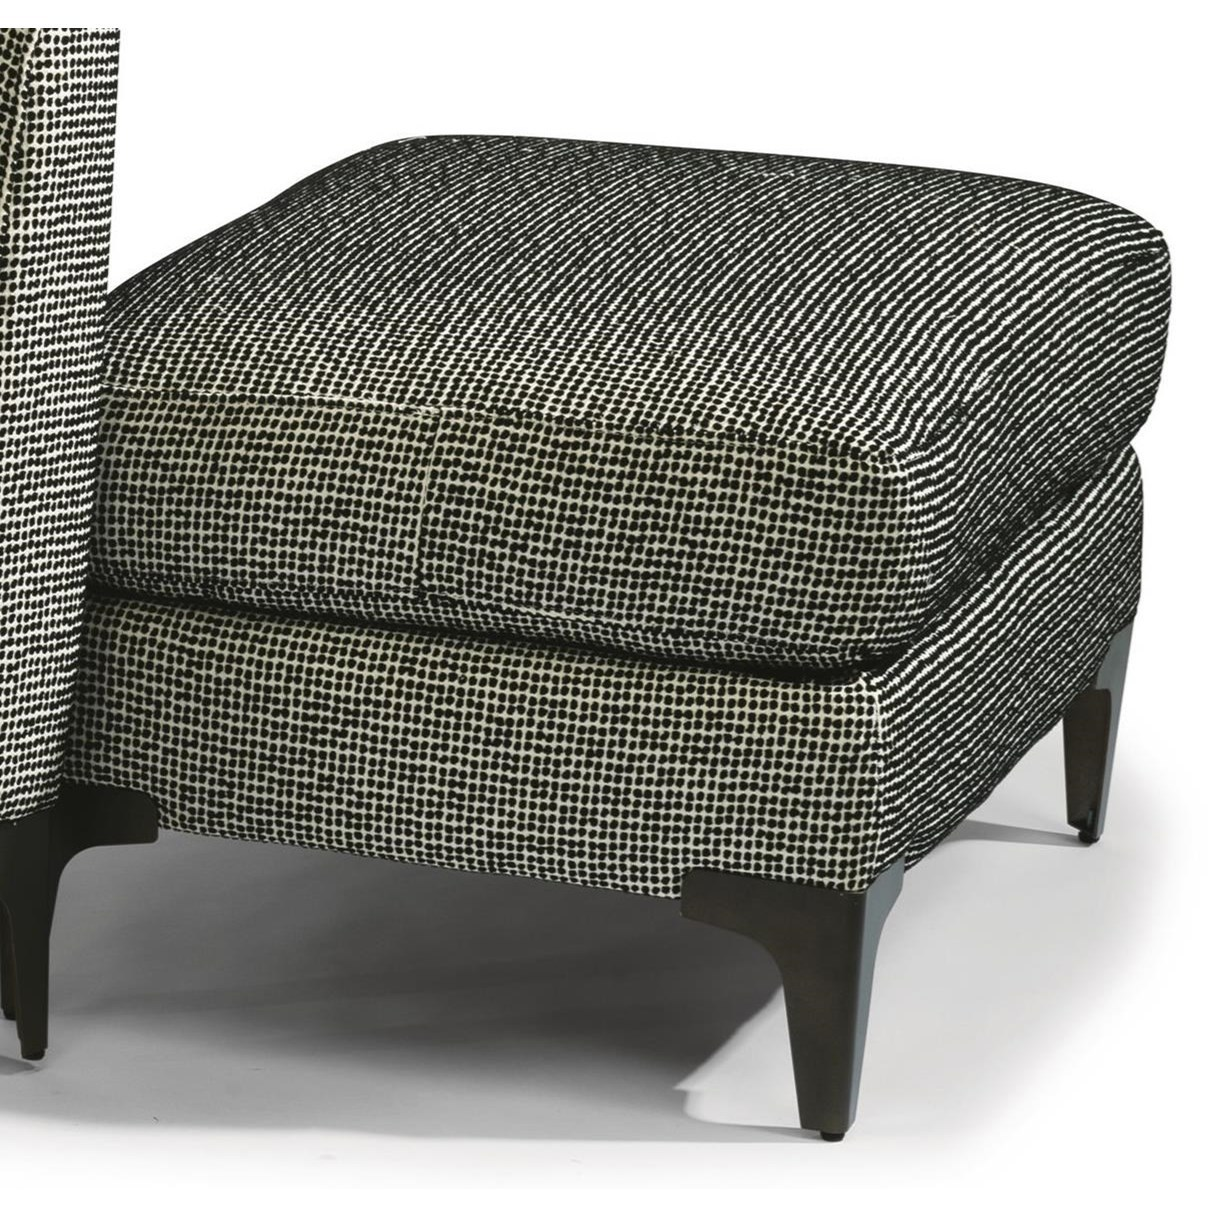 Samuel Ottoman  by Flexsteel at Mueller Furniture